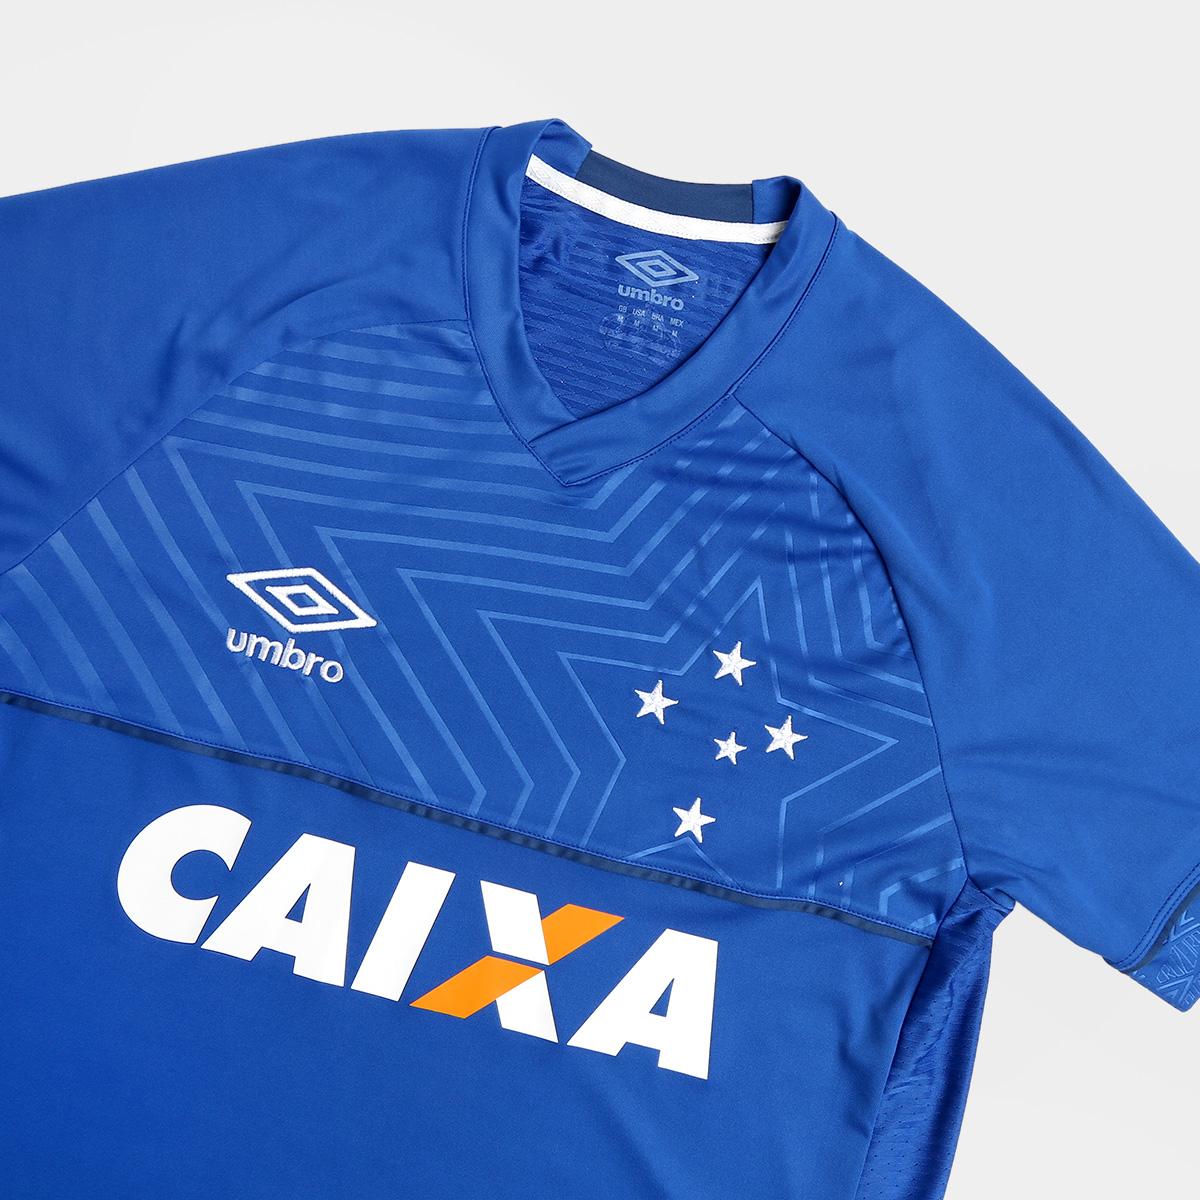 Camisa Cruzeiro 2018 I S Nº Torcedor Umbro Masculina - Azul com ... c242724360853